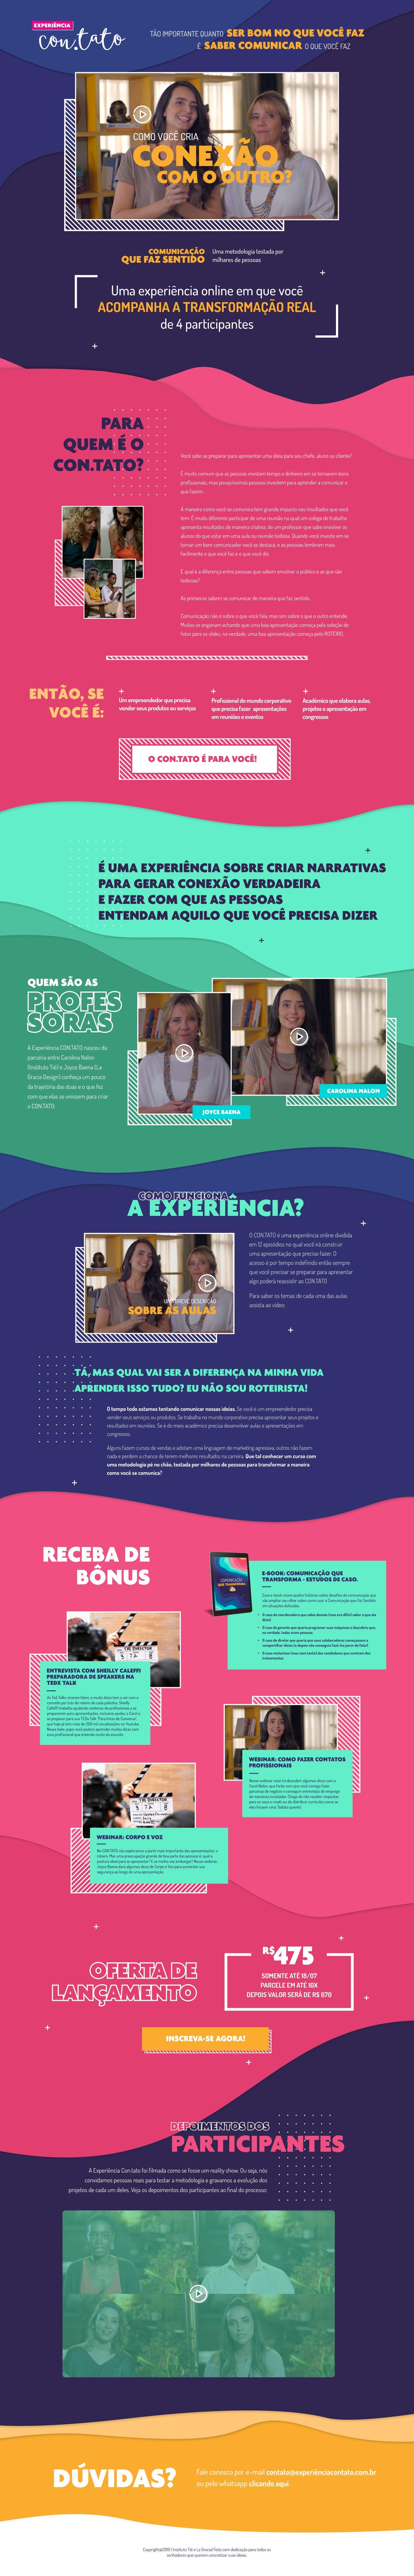 Página de vendas para curso Experiência Con.tato